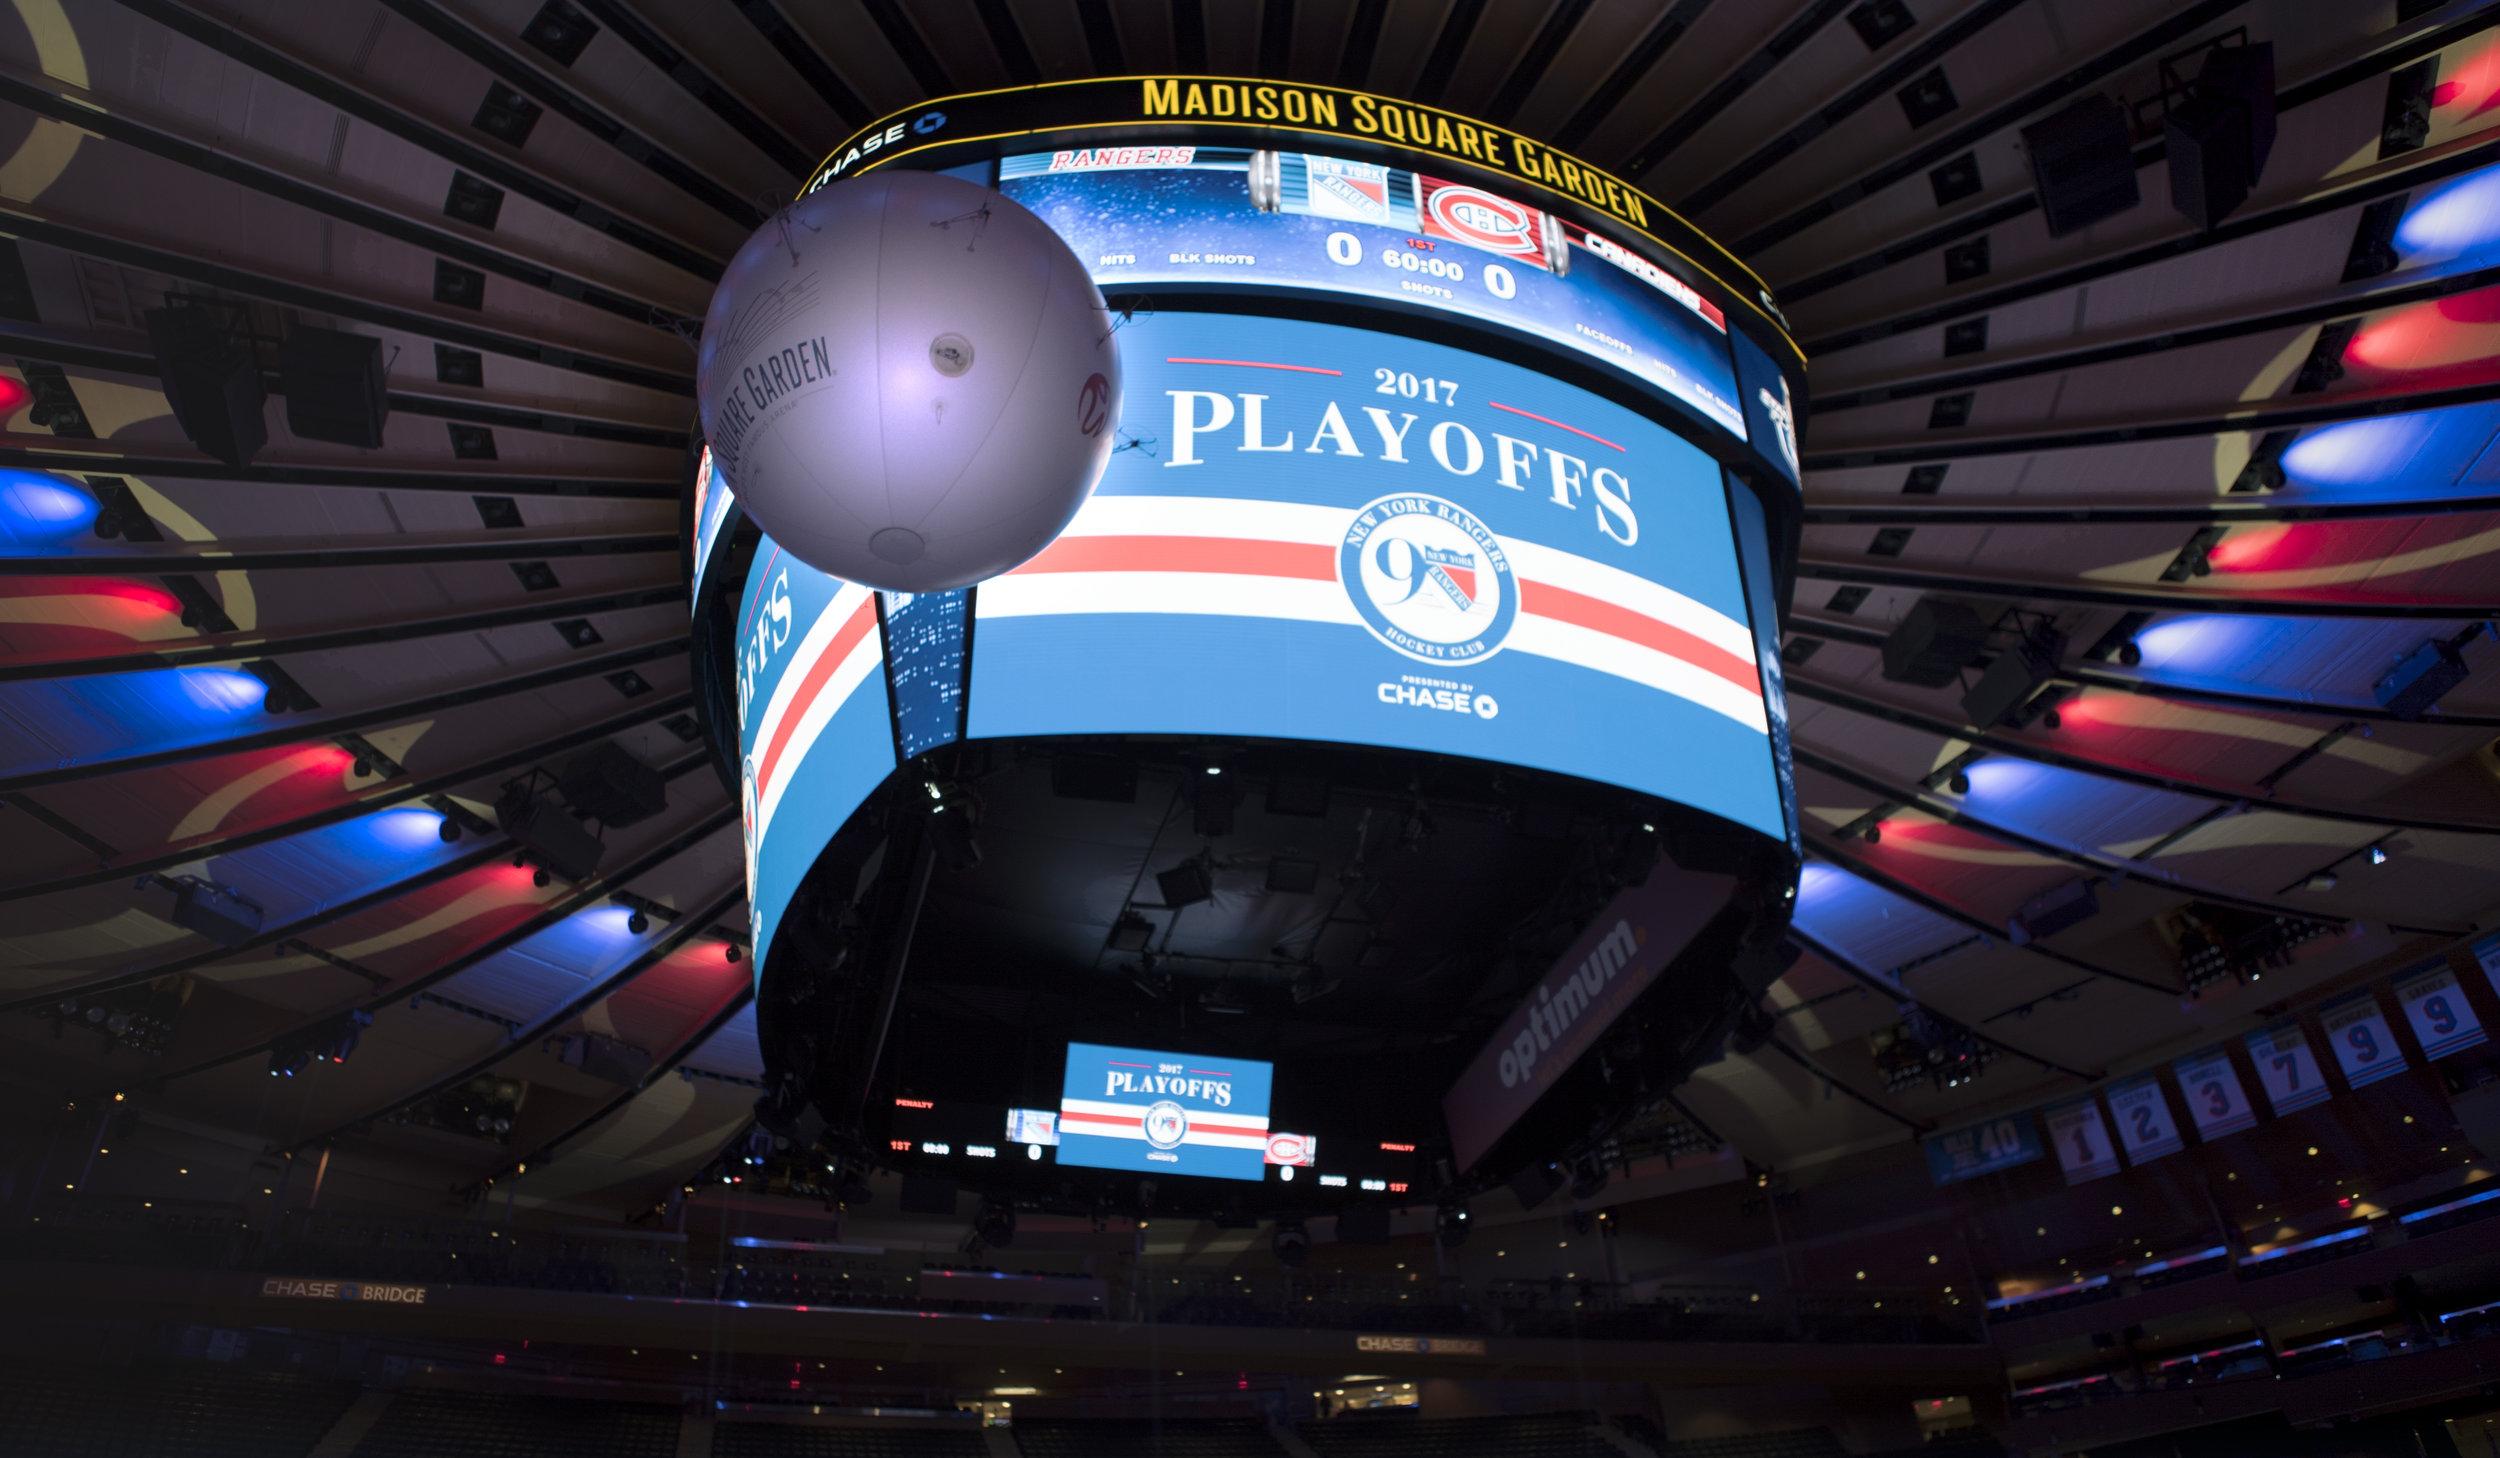 AirCamOne 2017 New York Rangers Playoffs